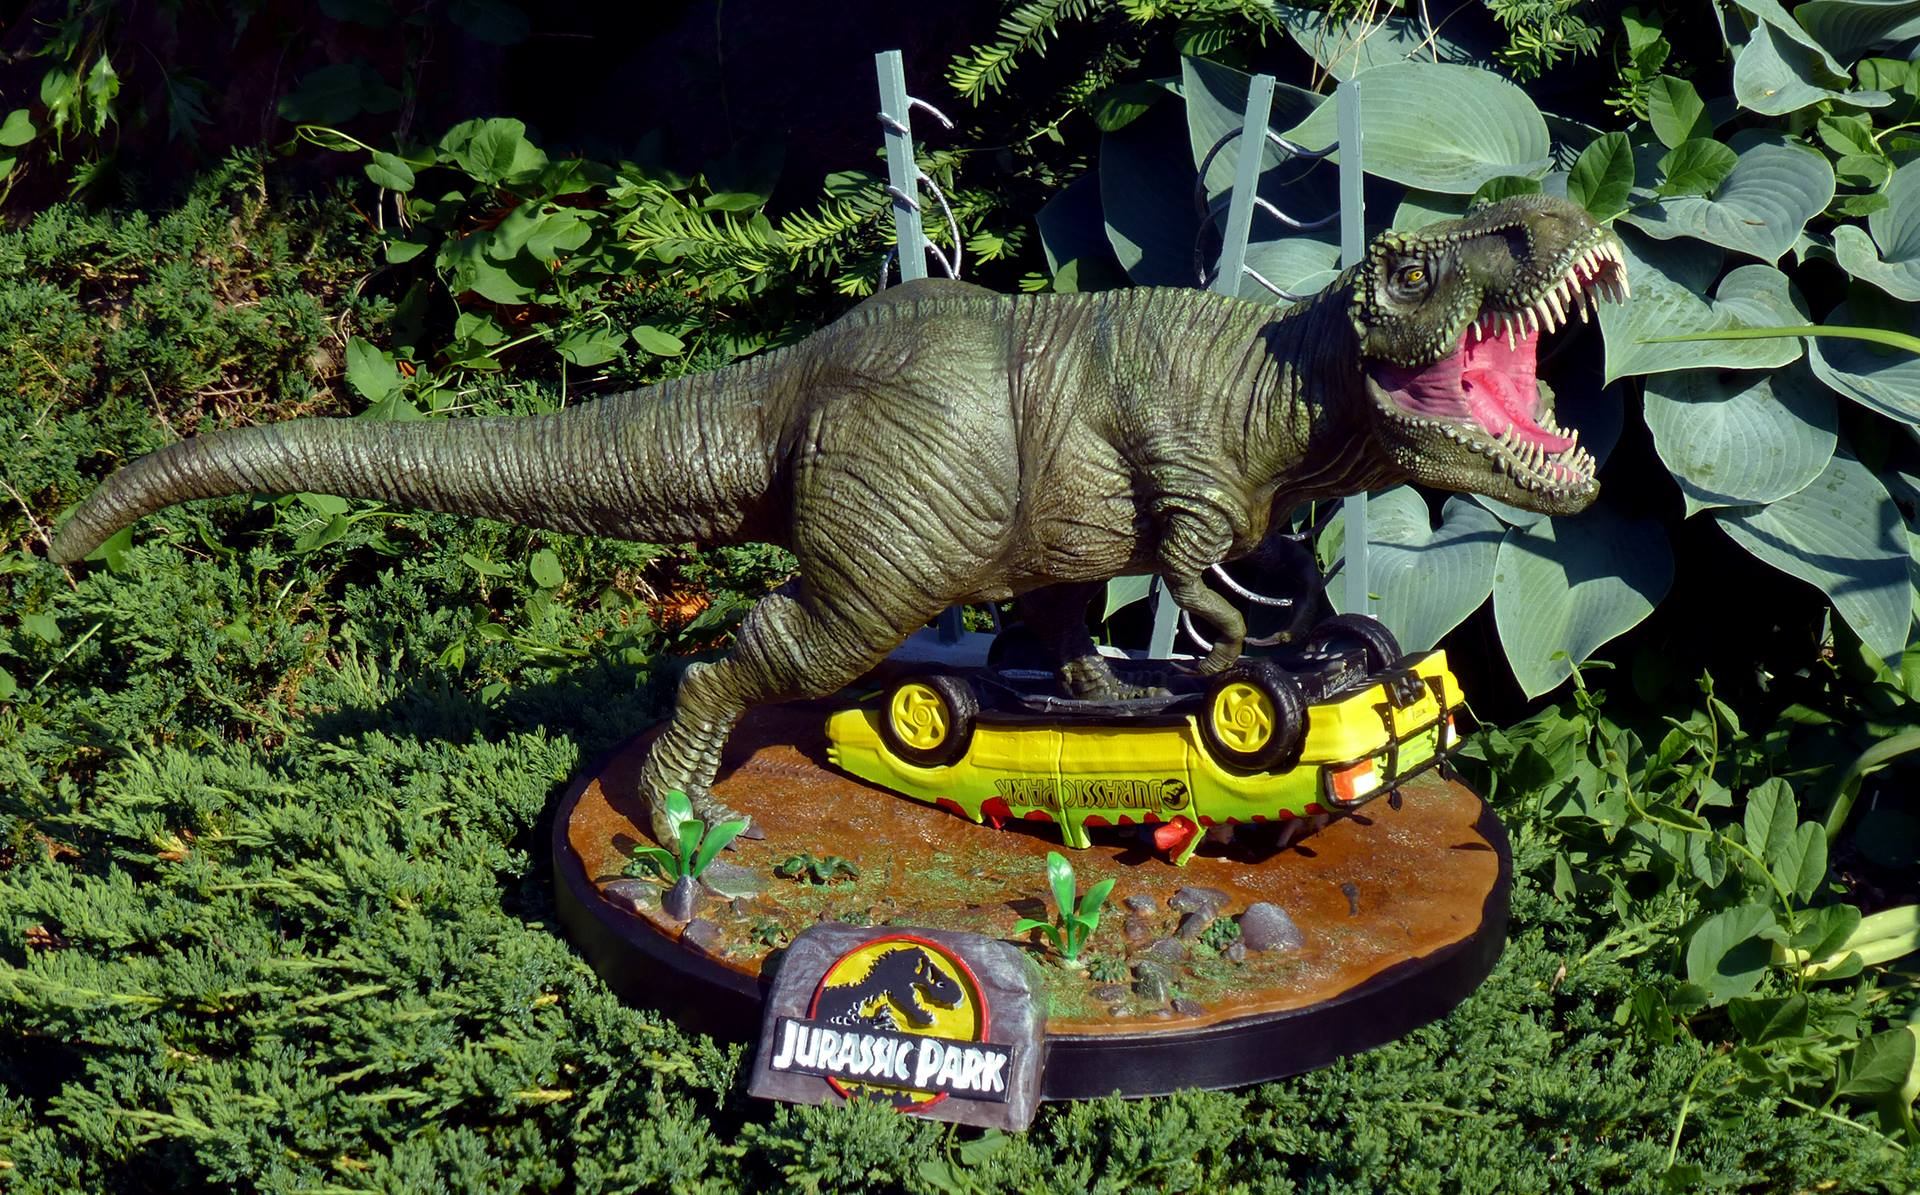 Jurassic Park 3D Printing Diorama Photo 4